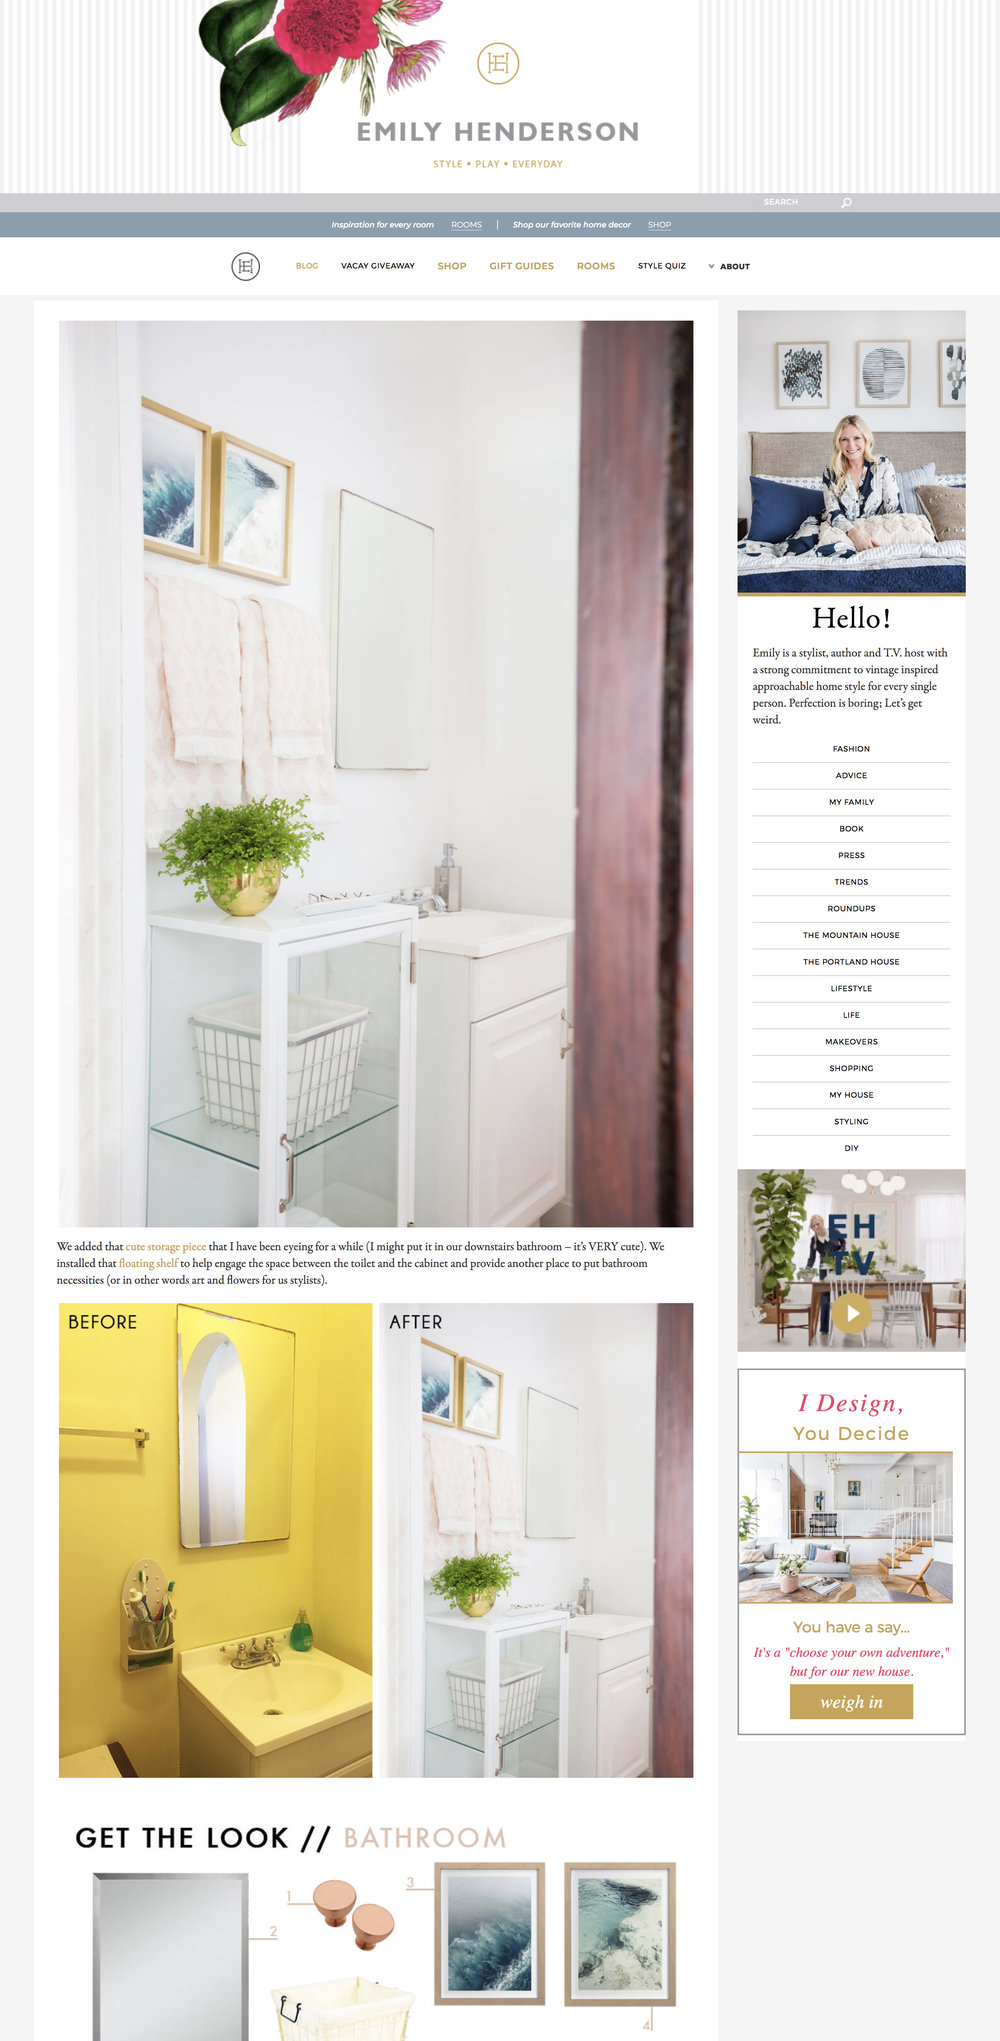 screencapture-stylebyemilyhenderson-blog-sylvias-makeover-quick-bathroom-refresh-2019-01-08-12_38_51b copy.jpg